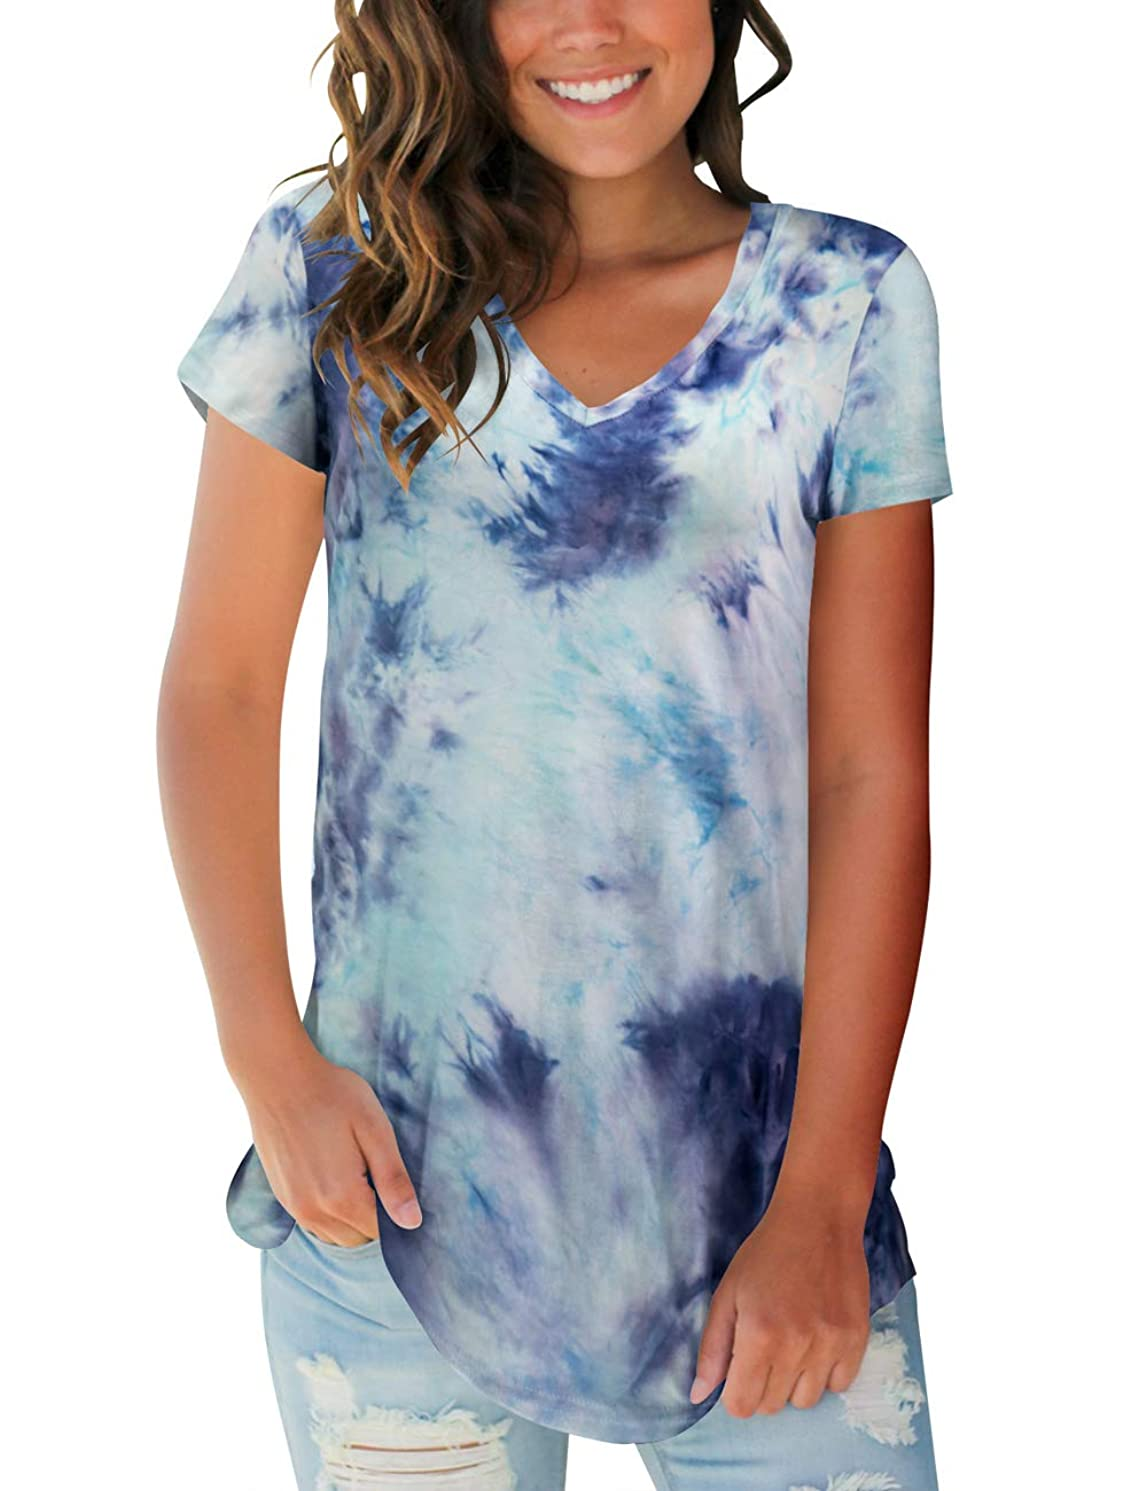 Women's Tops Tie Dye V Neck Summer Casual Short Sleeve T Shirts